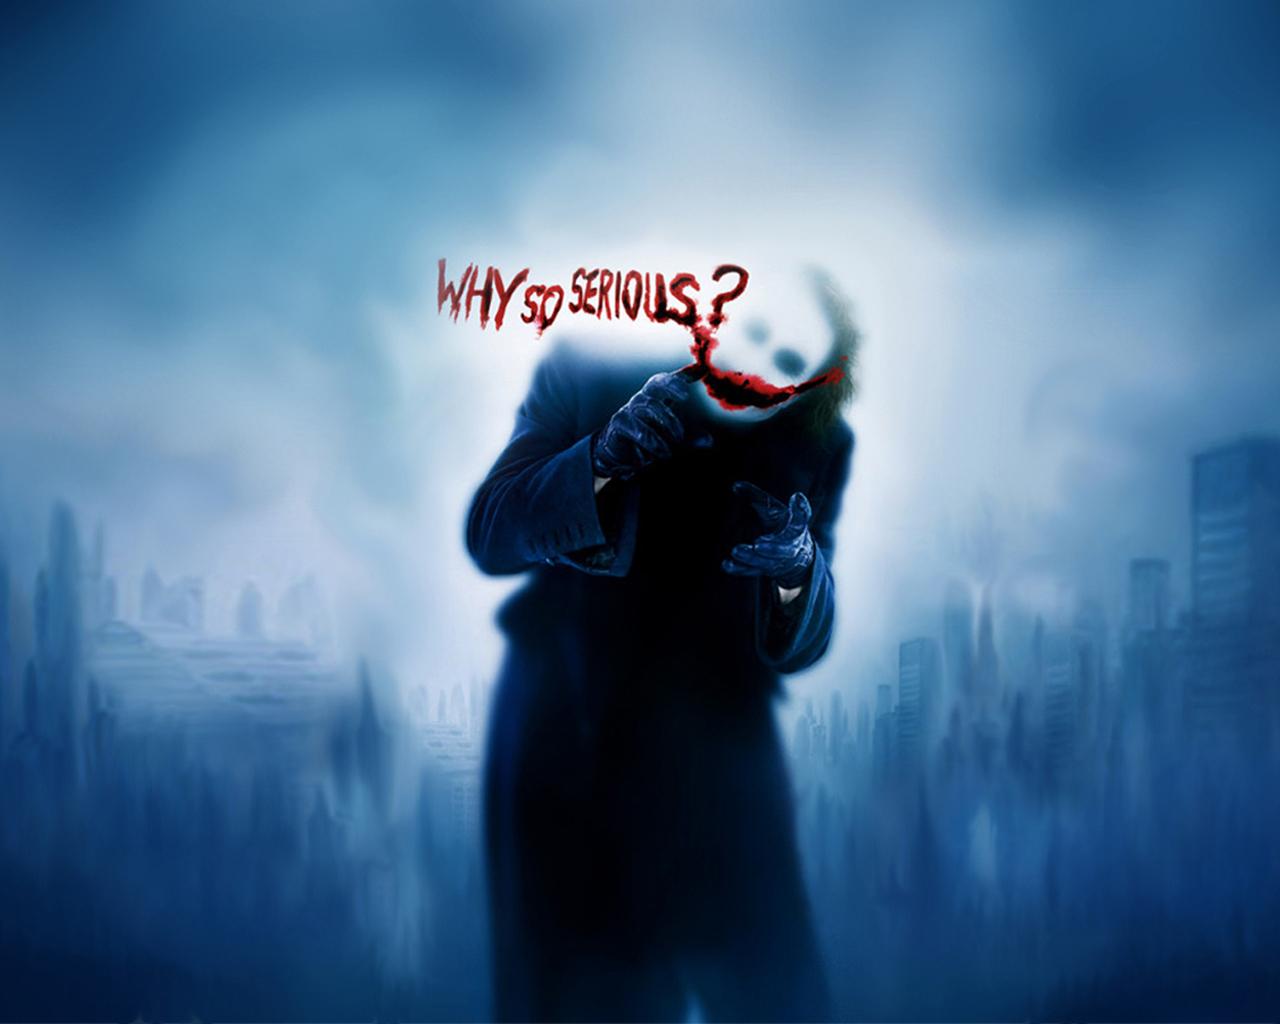 http://1.bp.blogspot.com/-gMlKPrTWPq4/T0AIC3Aj22I/AAAAAAAABlw/OPZjQ_6eigs/s1600/The-Joker-the-joker-1457929-1280-1024.jpg